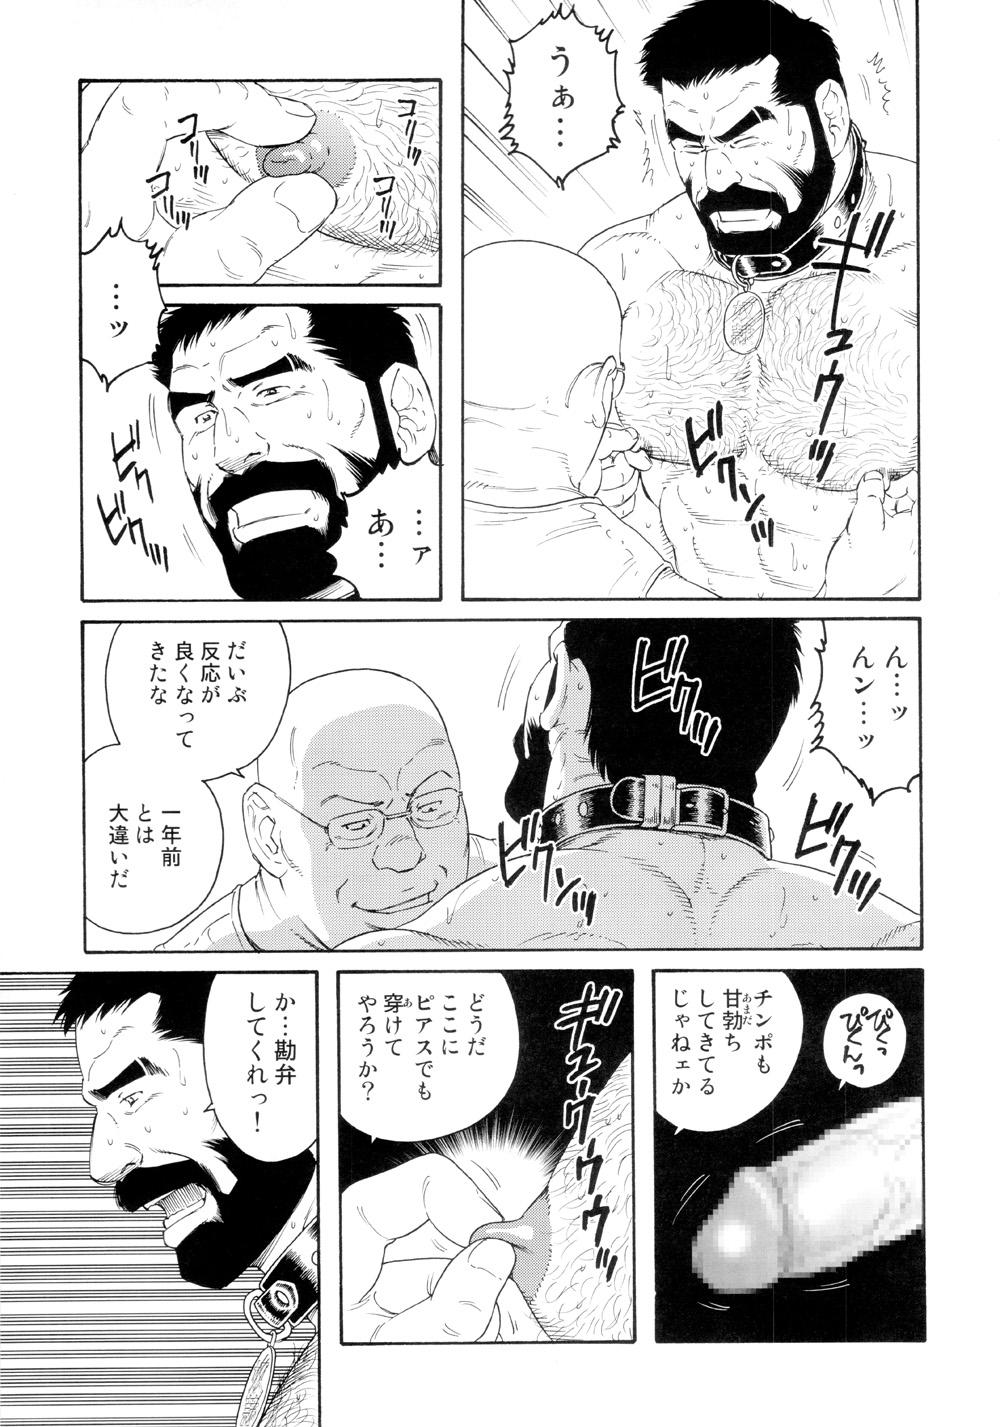 Genryu Chapter 1 8